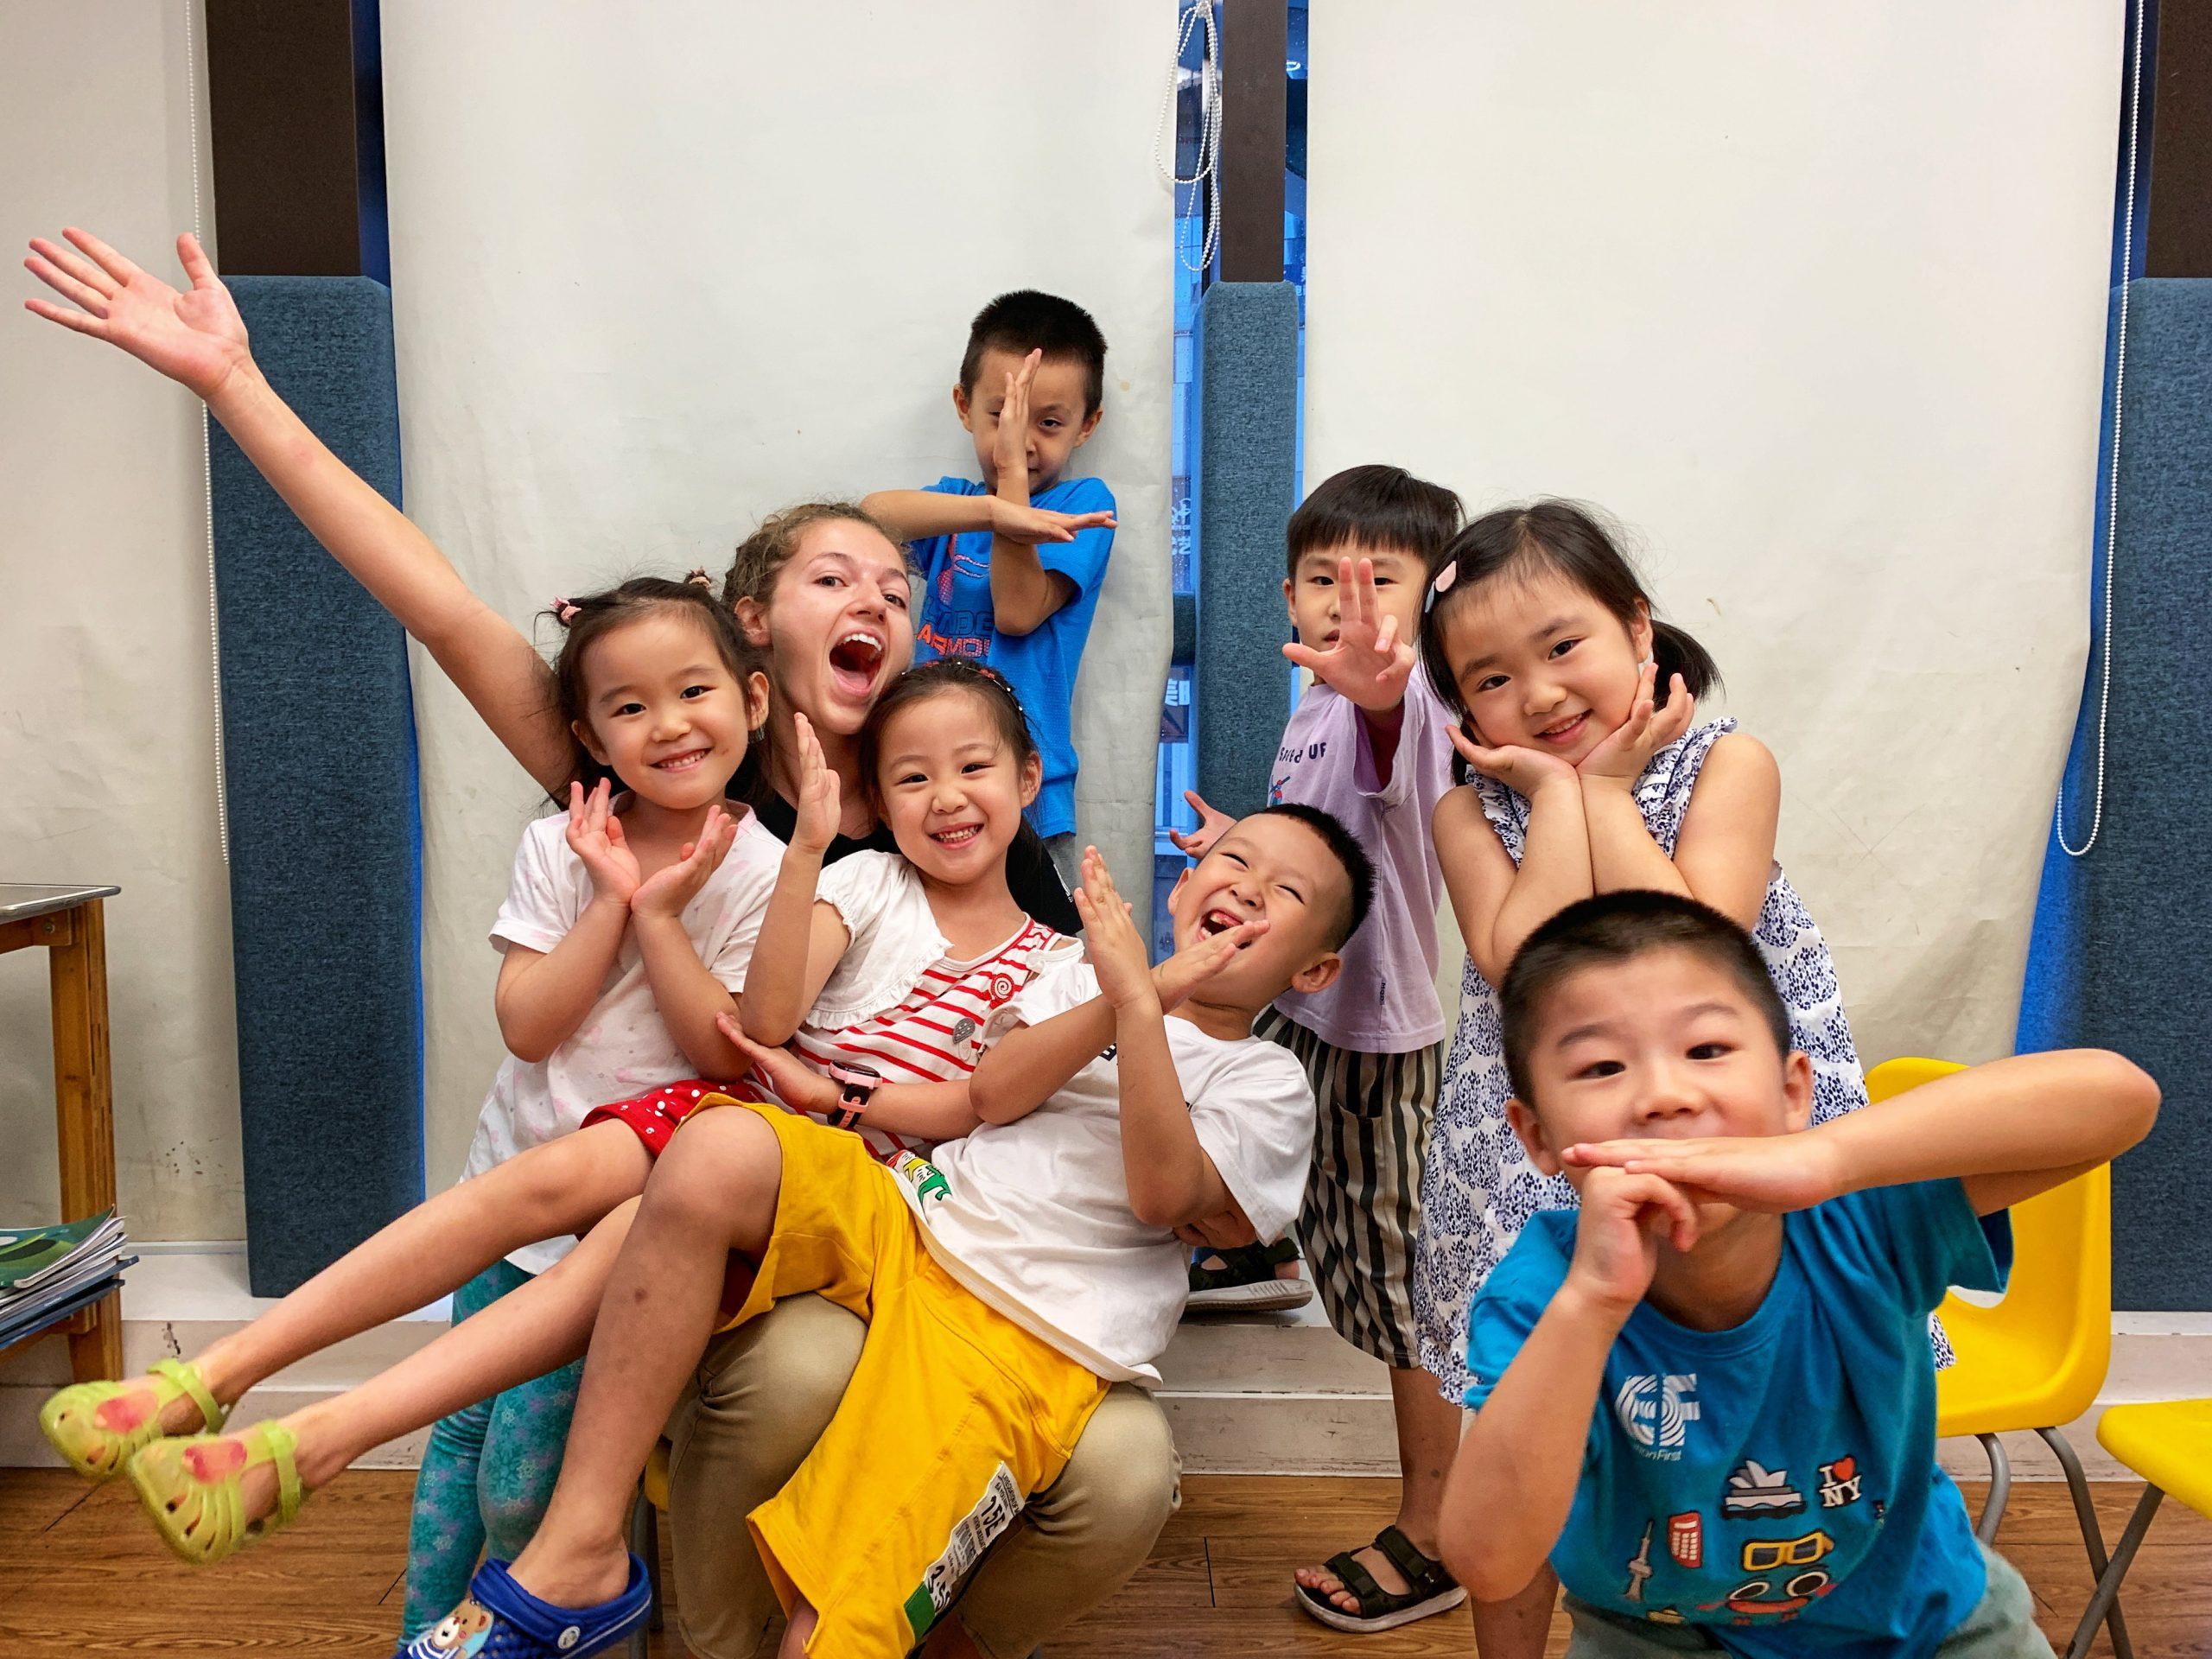 esl teacher Britanny with her students